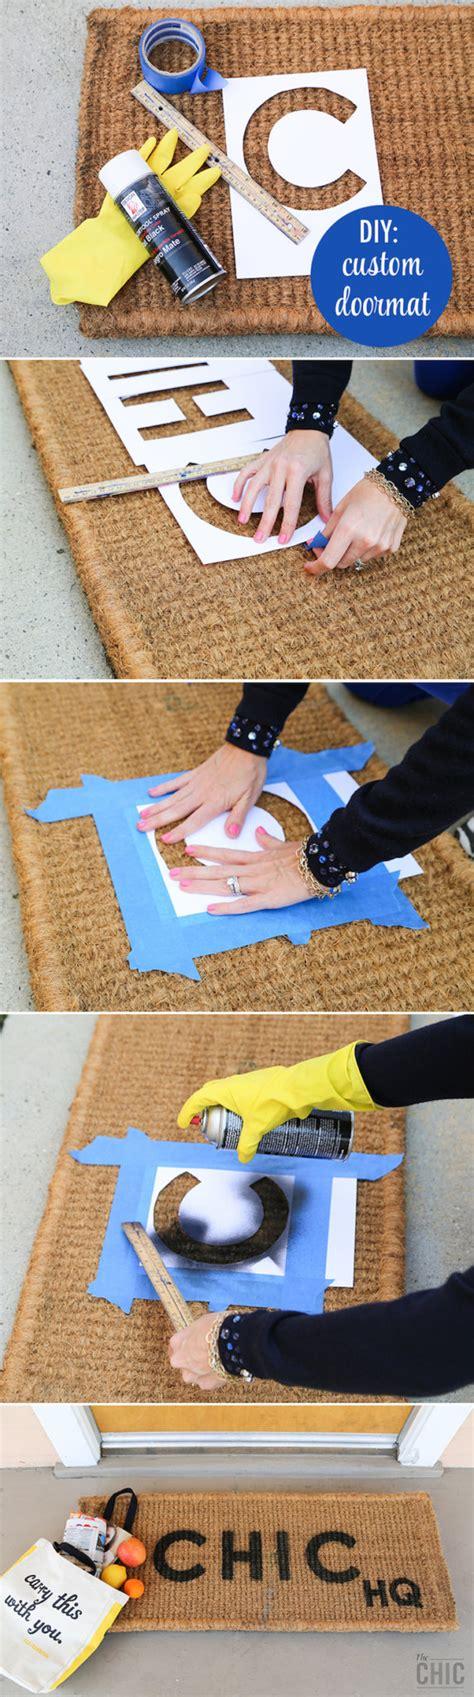 diy custom doormat  chic site